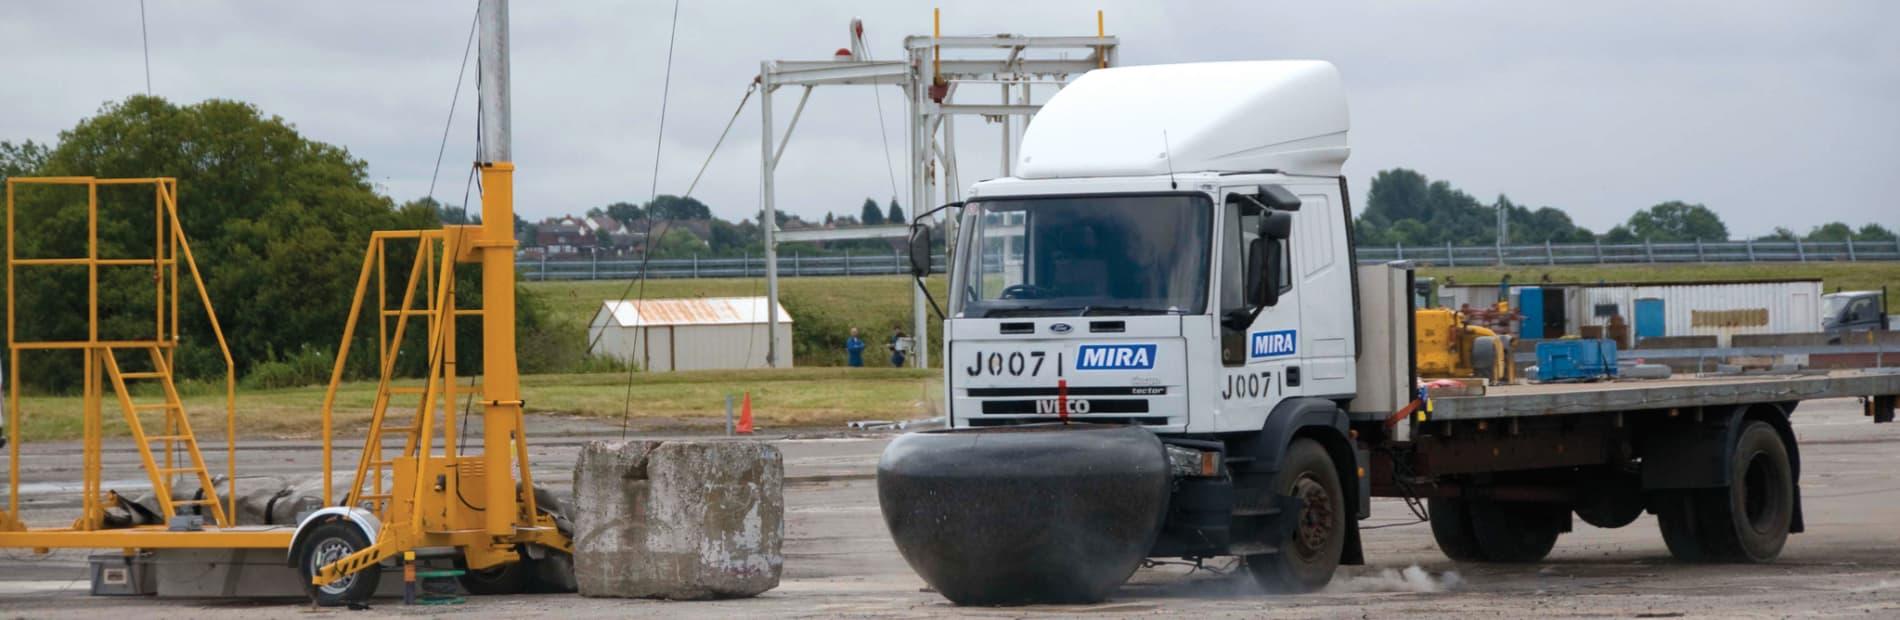 Bollard crash test